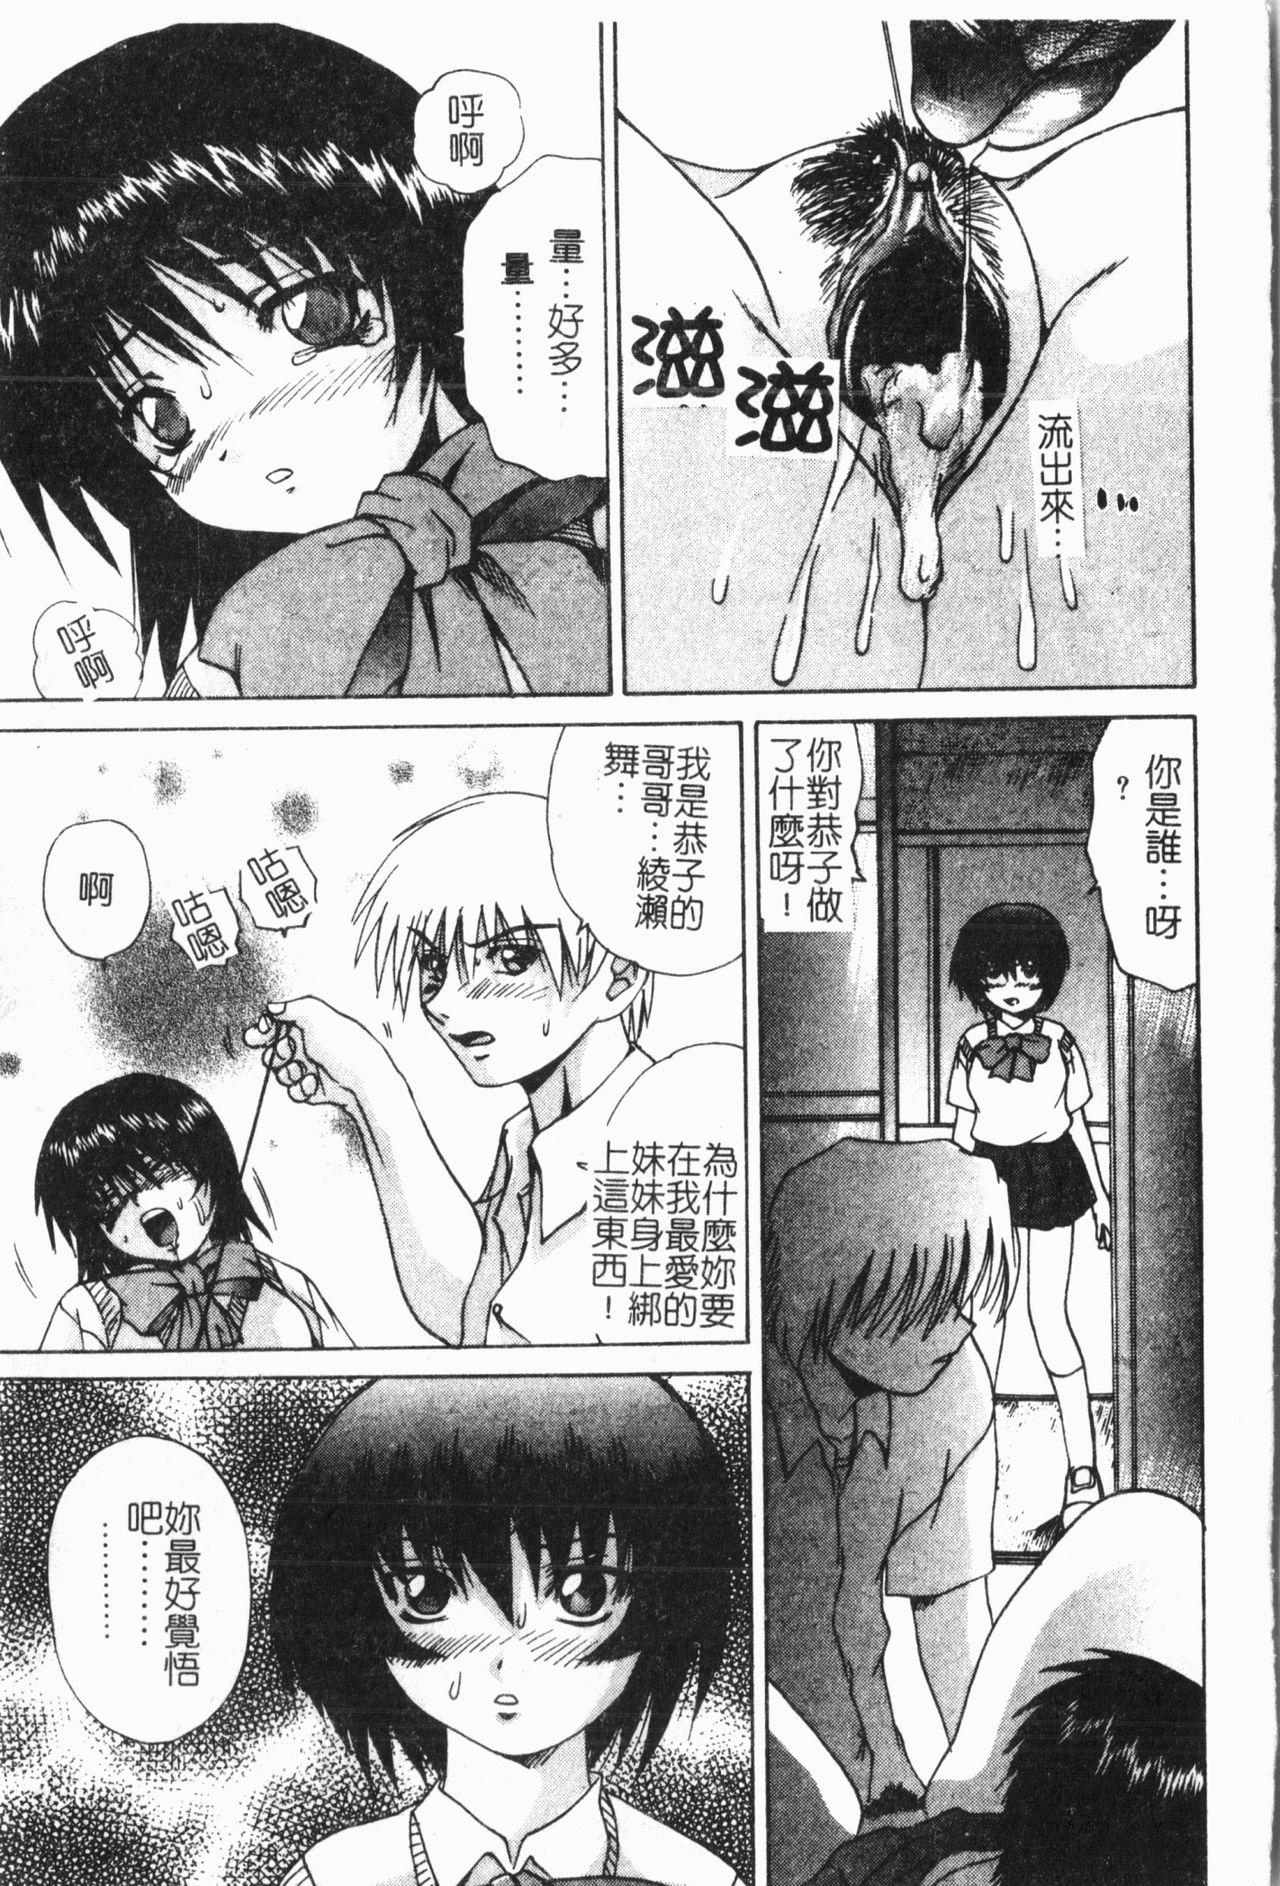 Imouto Koishi 6 113